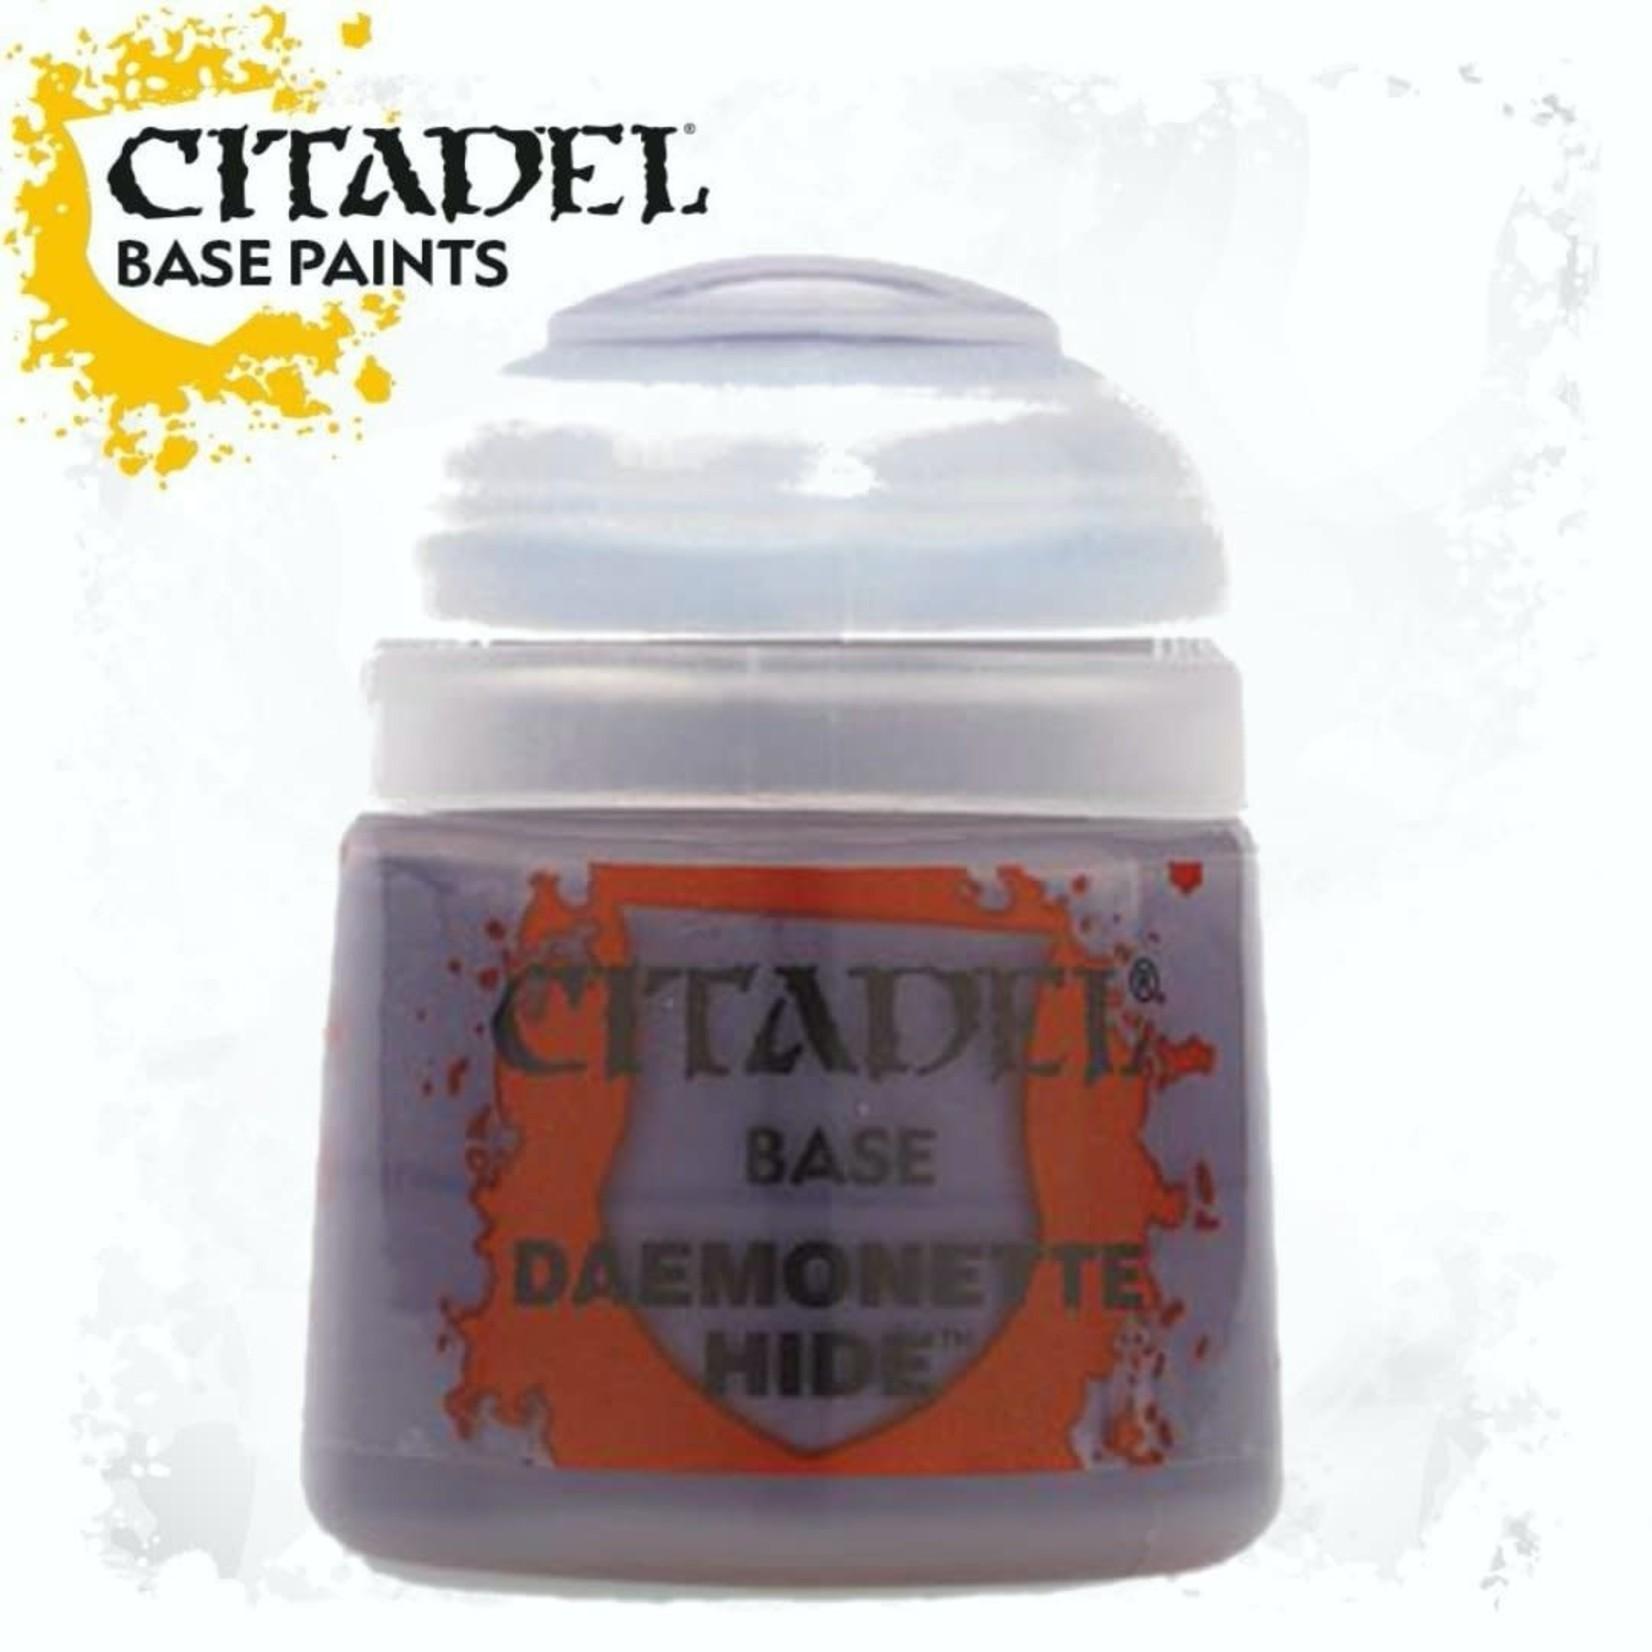 Citadel Citadel Paint - Base: Daemonette Hide